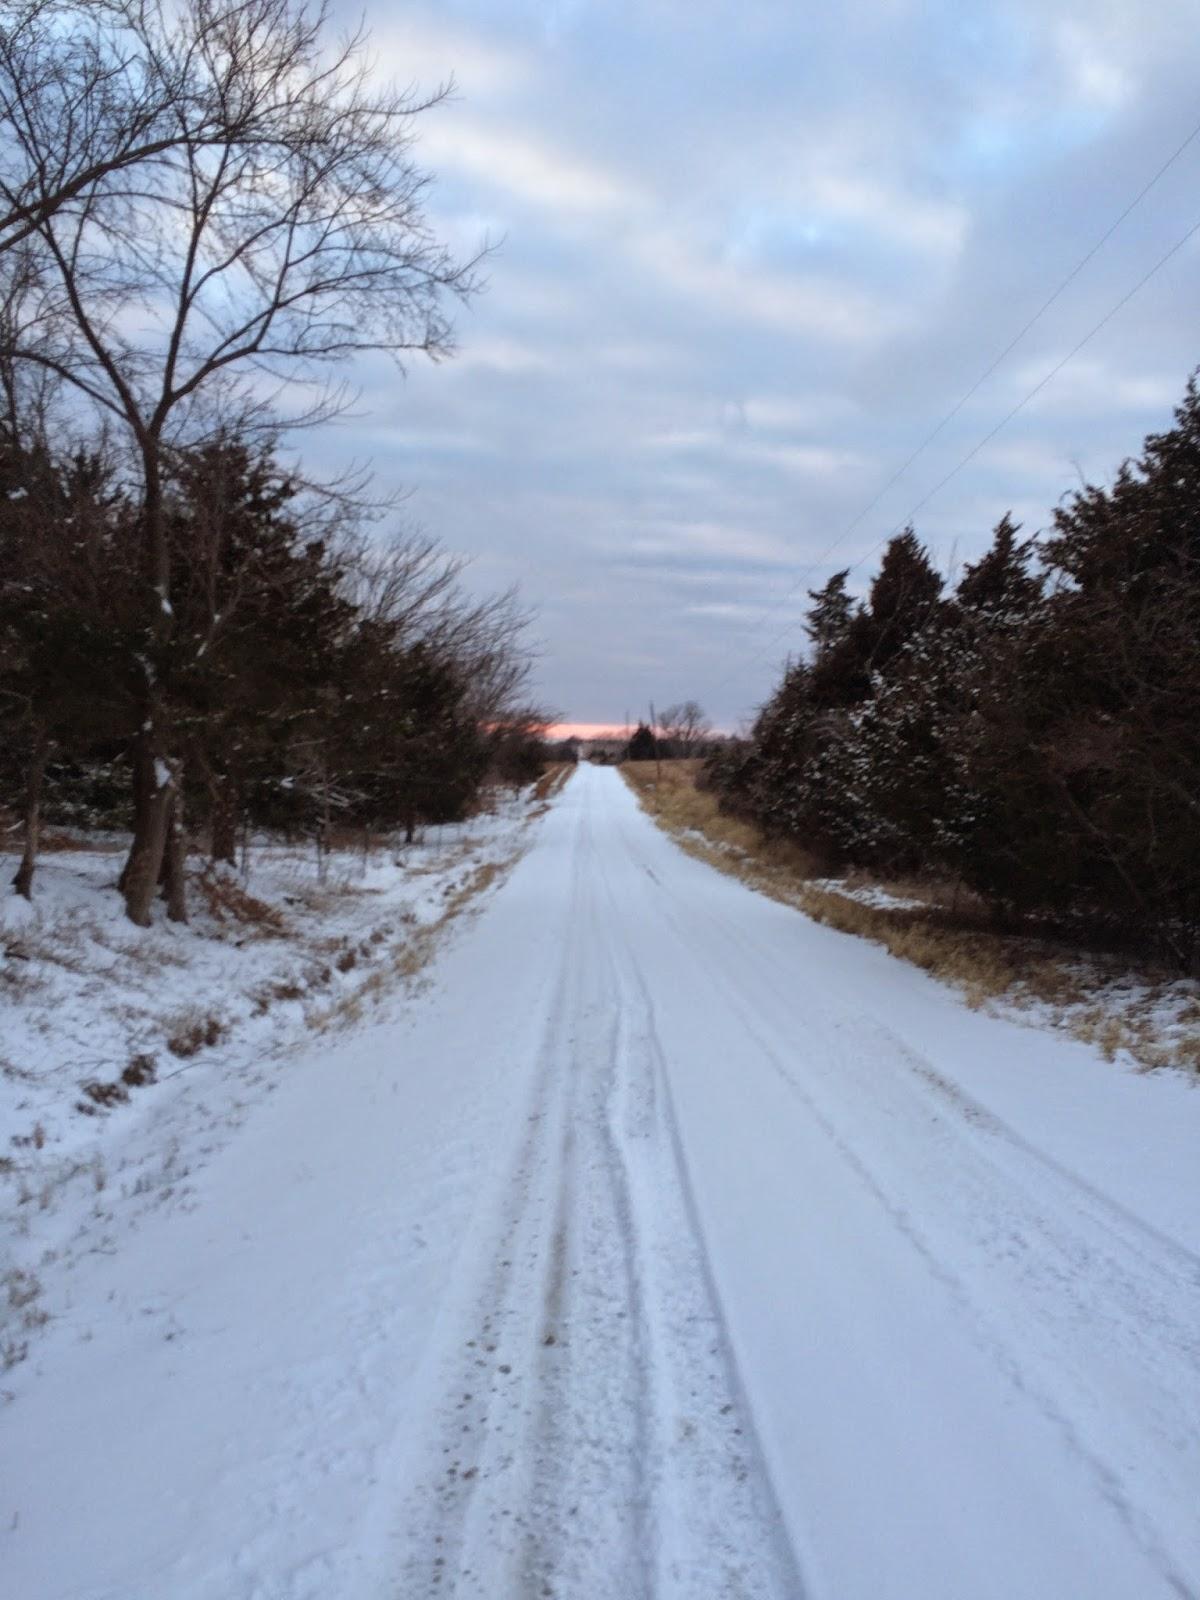 Snowy road in Kansas